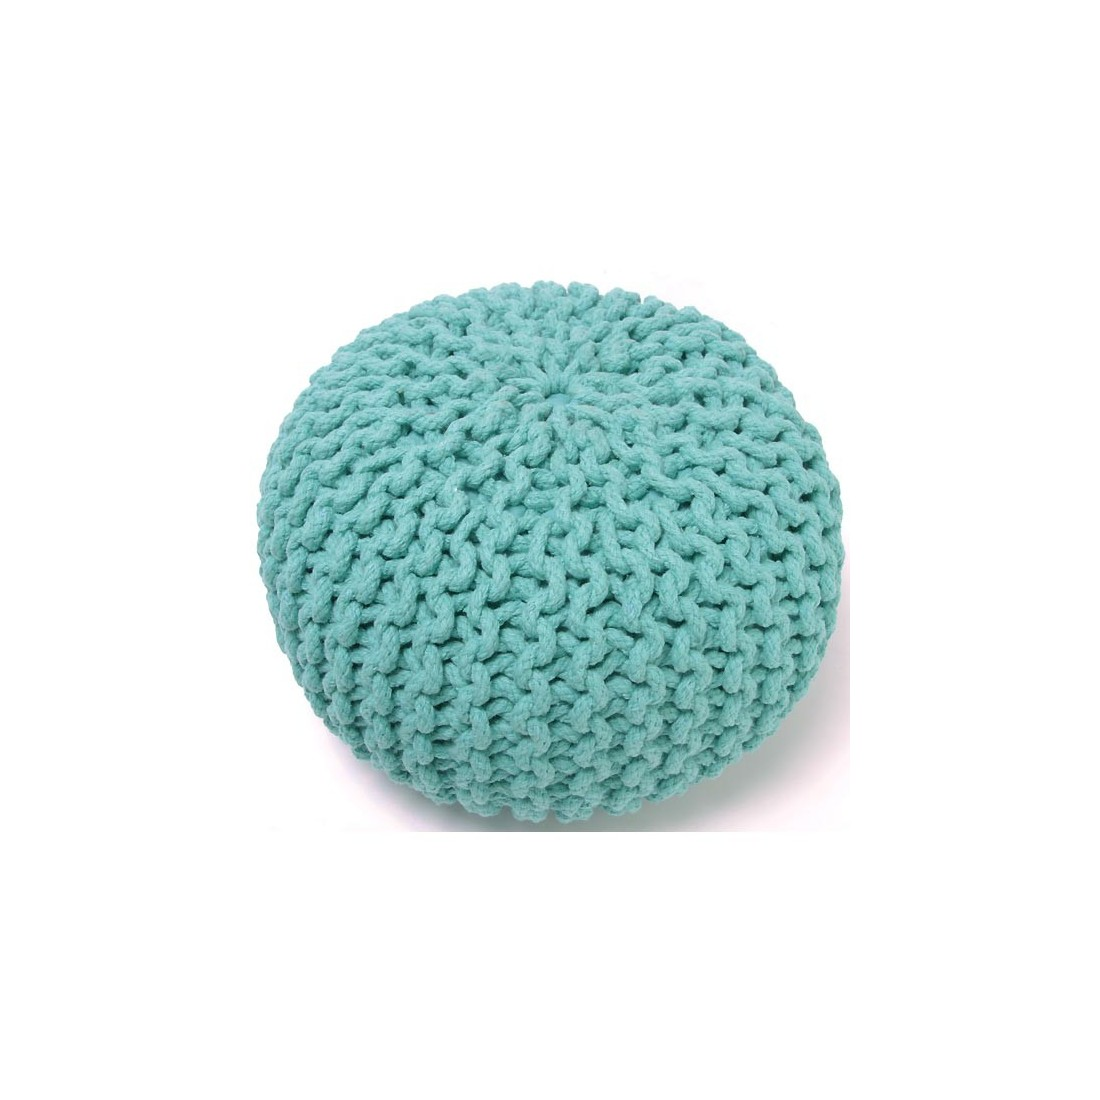 pouf enfant coton effet maille tricot lili bleu nattiot ma chambramoi. Black Bedroom Furniture Sets. Home Design Ideas